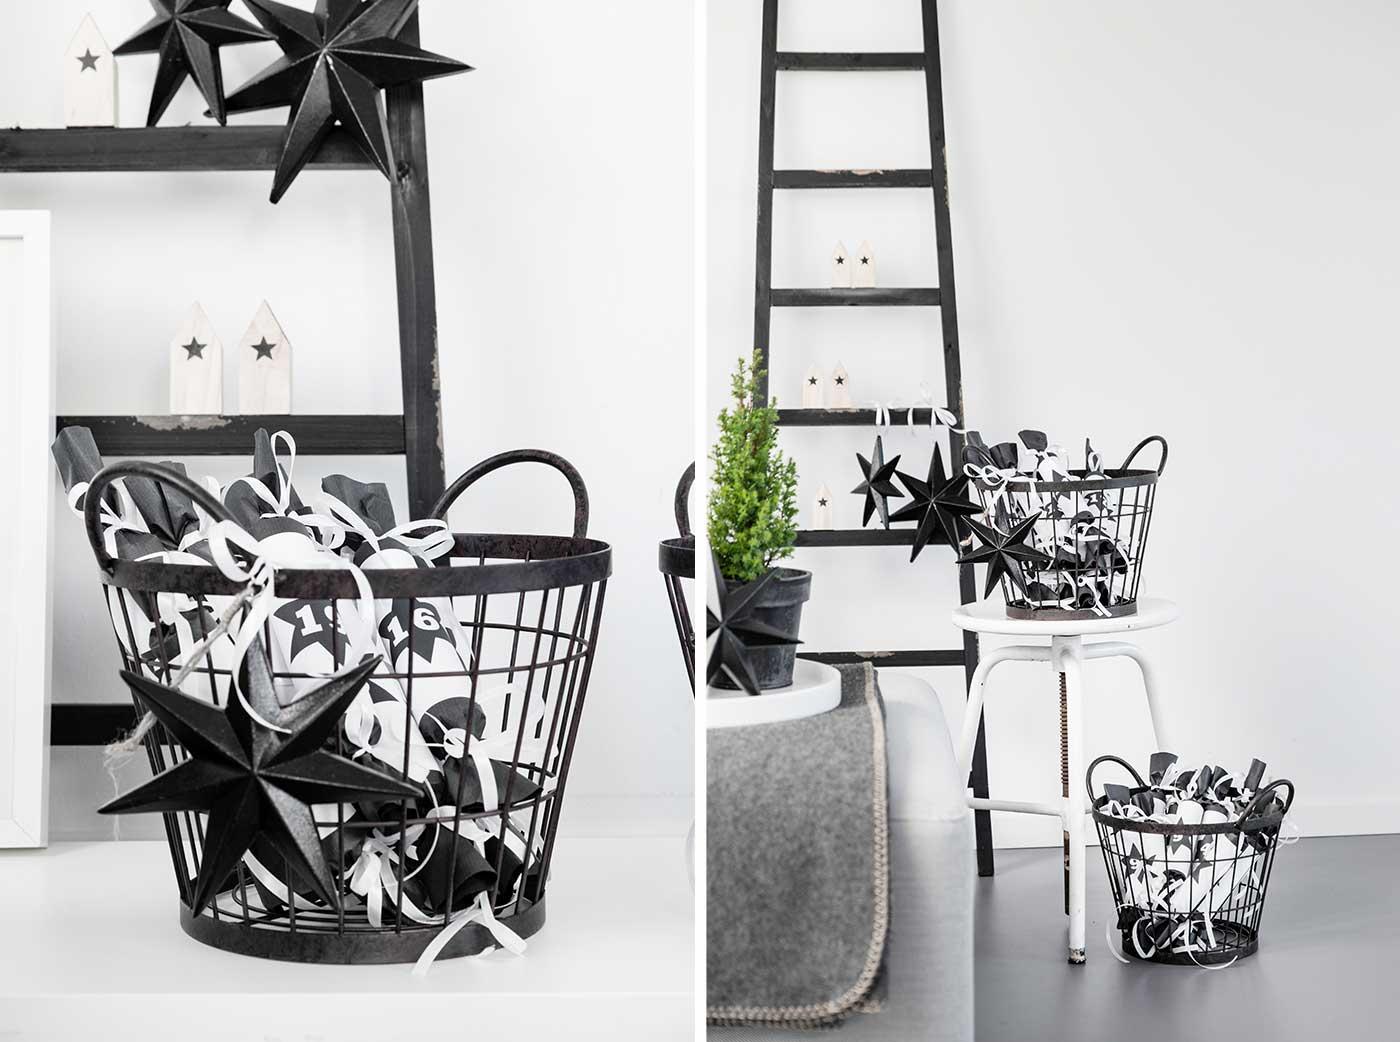 ideen zum selber basteln. Black Bedroom Furniture Sets. Home Design Ideas